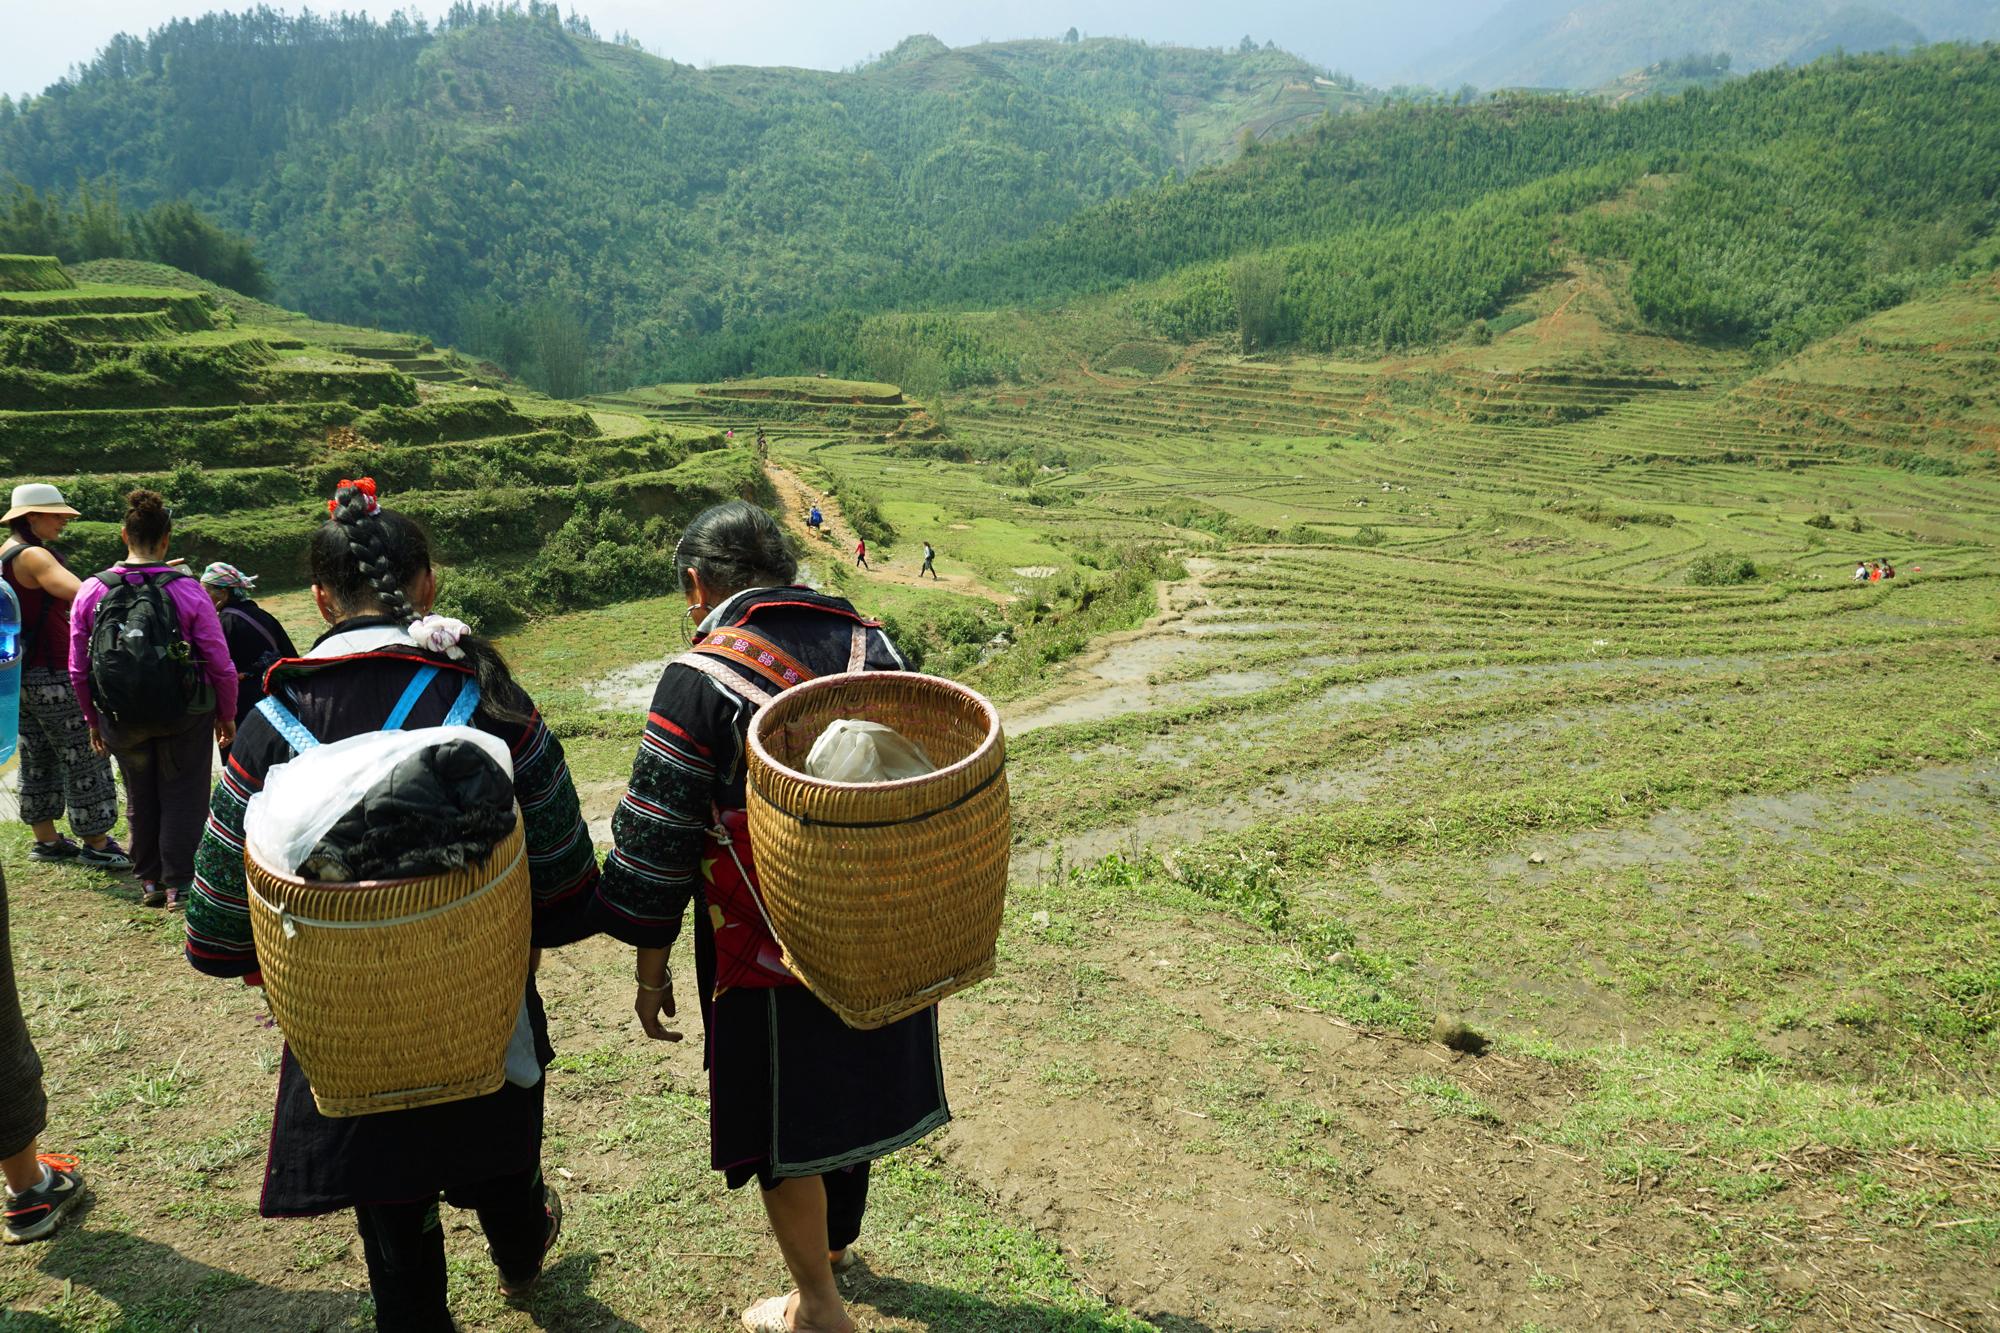 Hiking with Hmong women through rice fields, Sapa, Vietnam